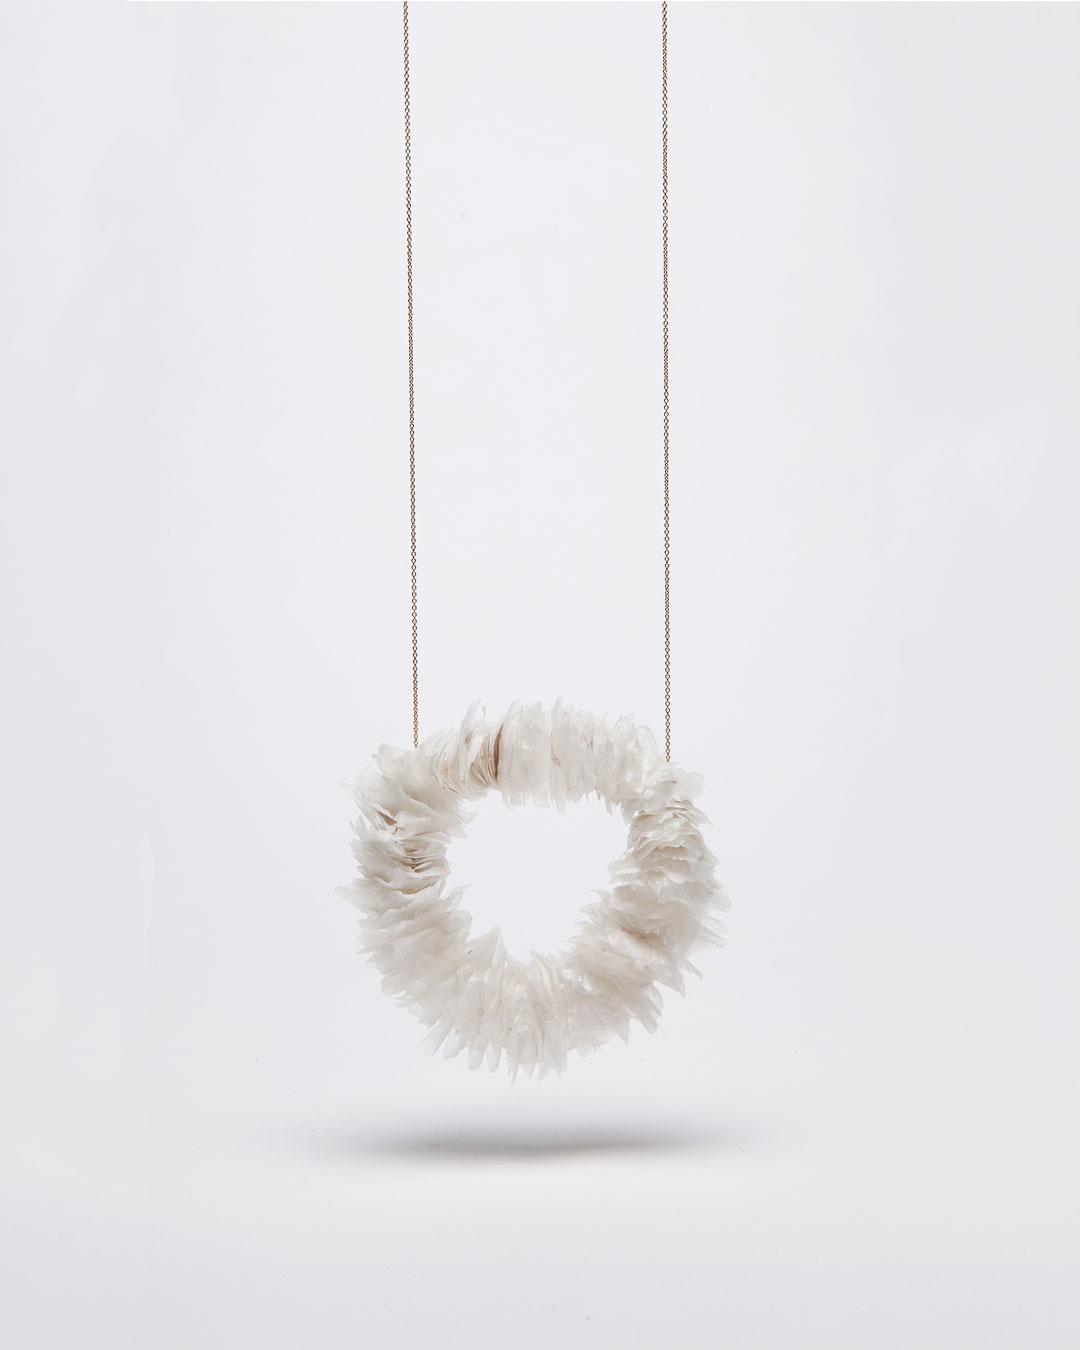 Annamaria Leiste, Meeresraunen 1 (Sea Whisper 1), 2014, necklace; gold, fish scales, 340 x 30 x 10 mm, €885